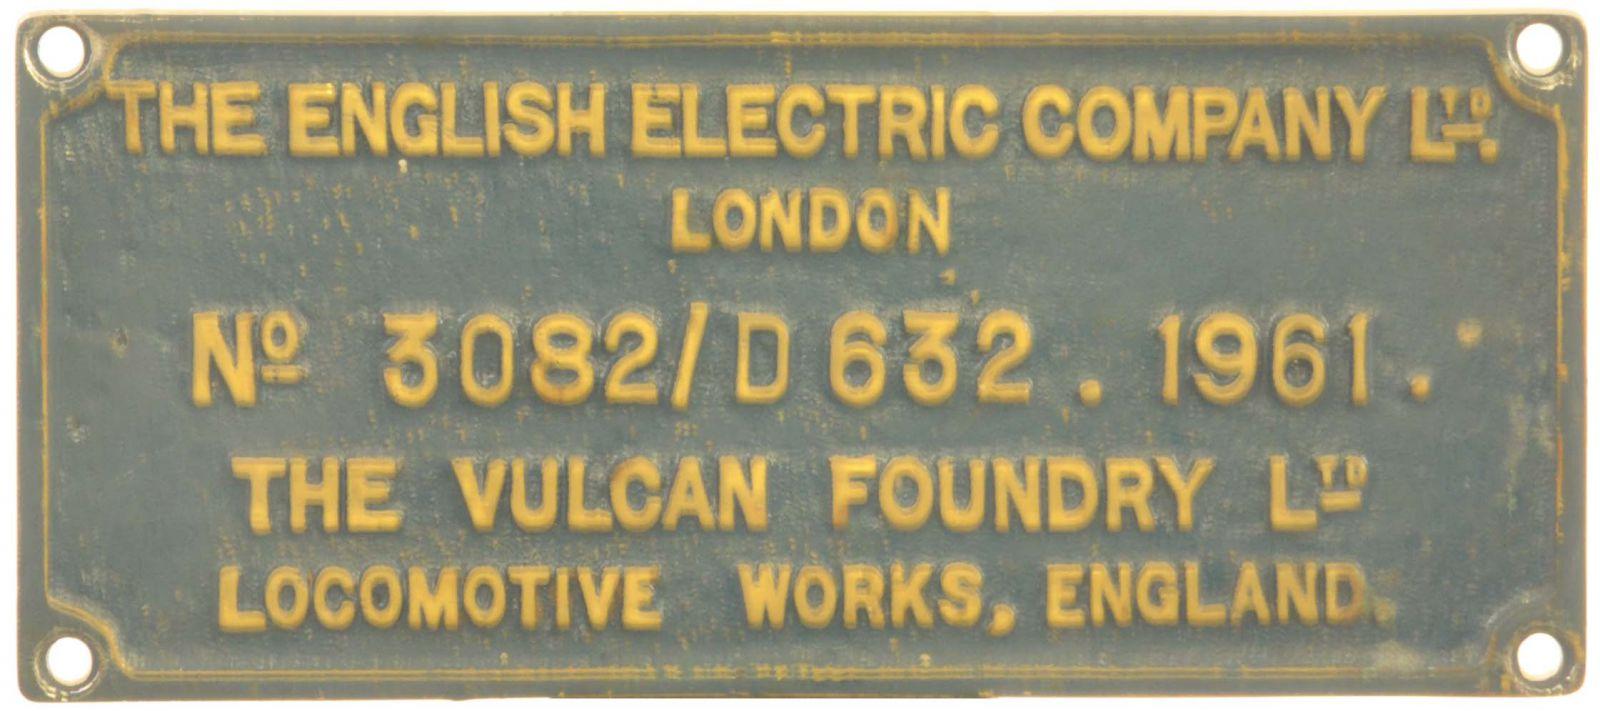 Lot 3 - Railway Locomotive Worksplates (Diesel), EE, 3082, D632. 1961 (40136): A worksplate, ENGLISH